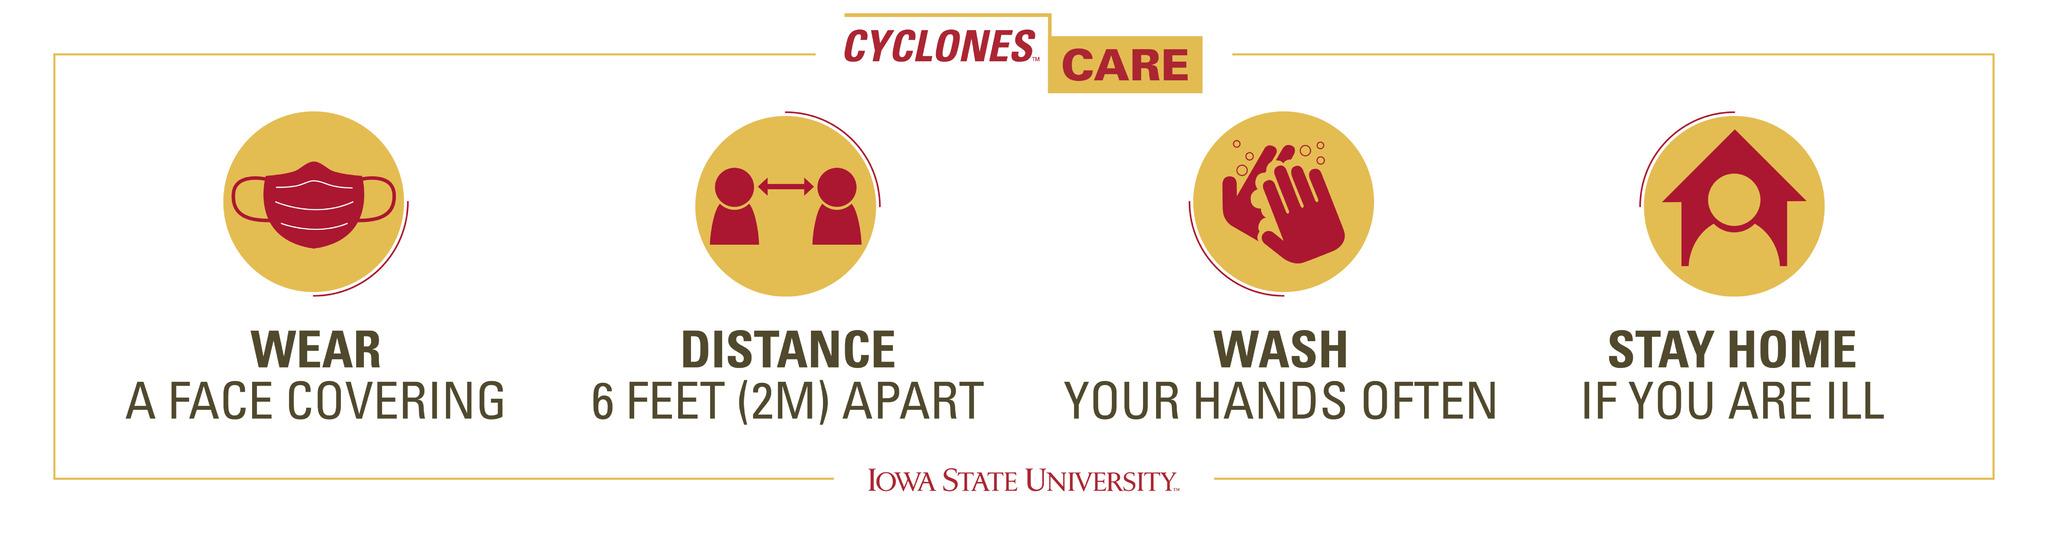 Cyclones Care